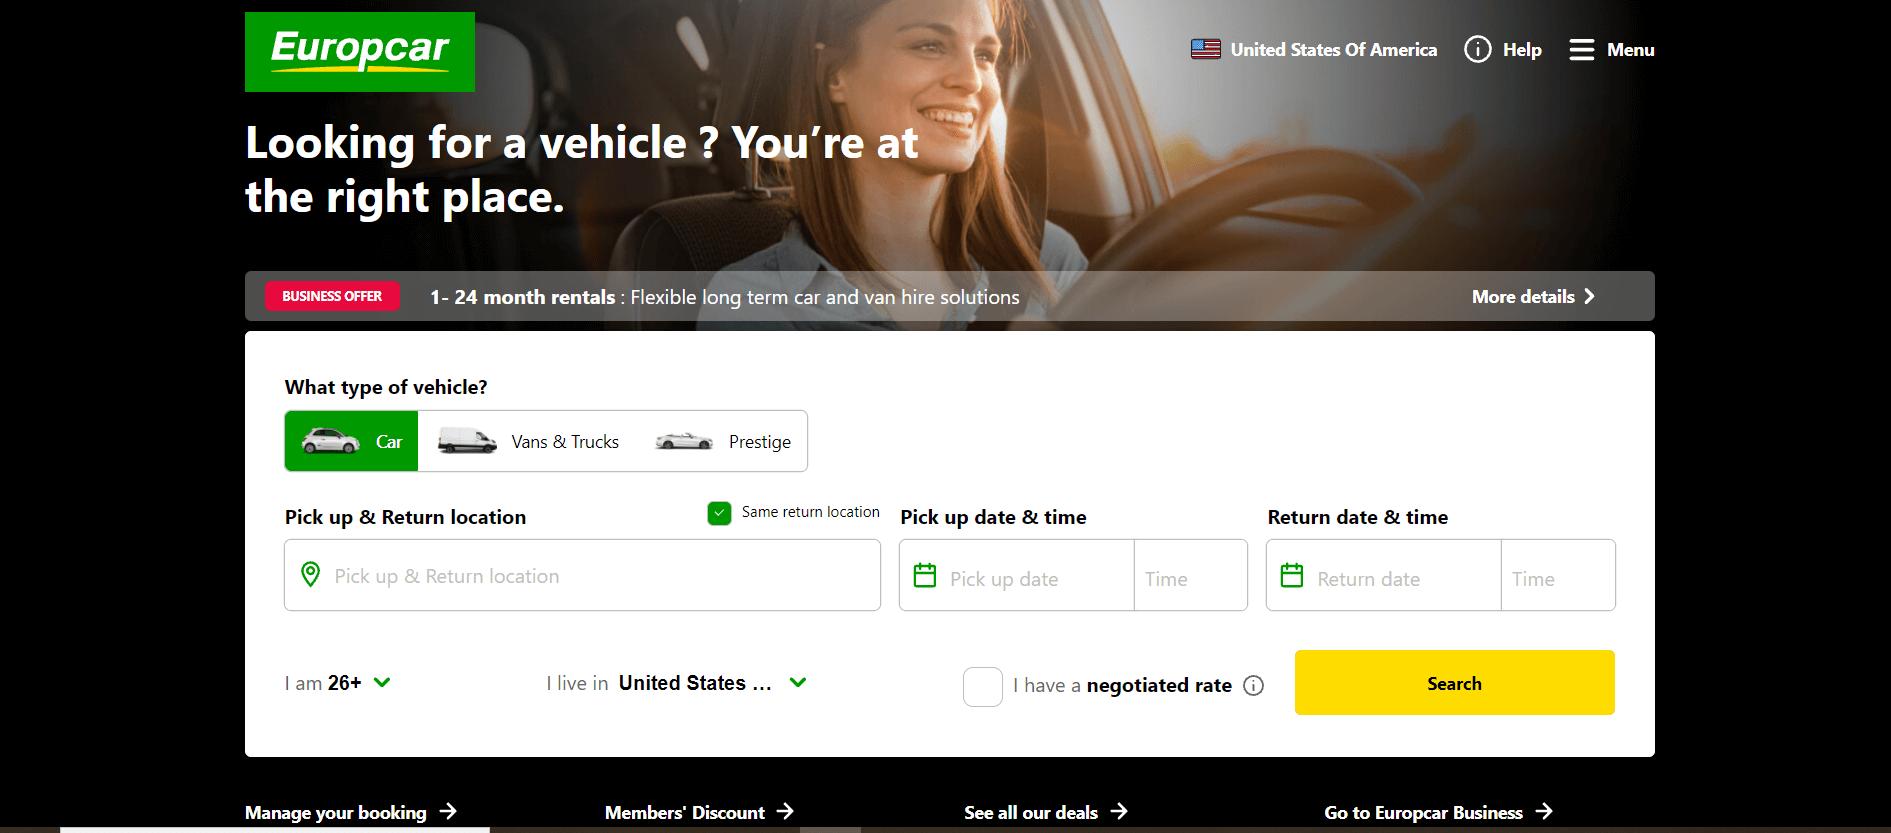 Europcar's homepage.